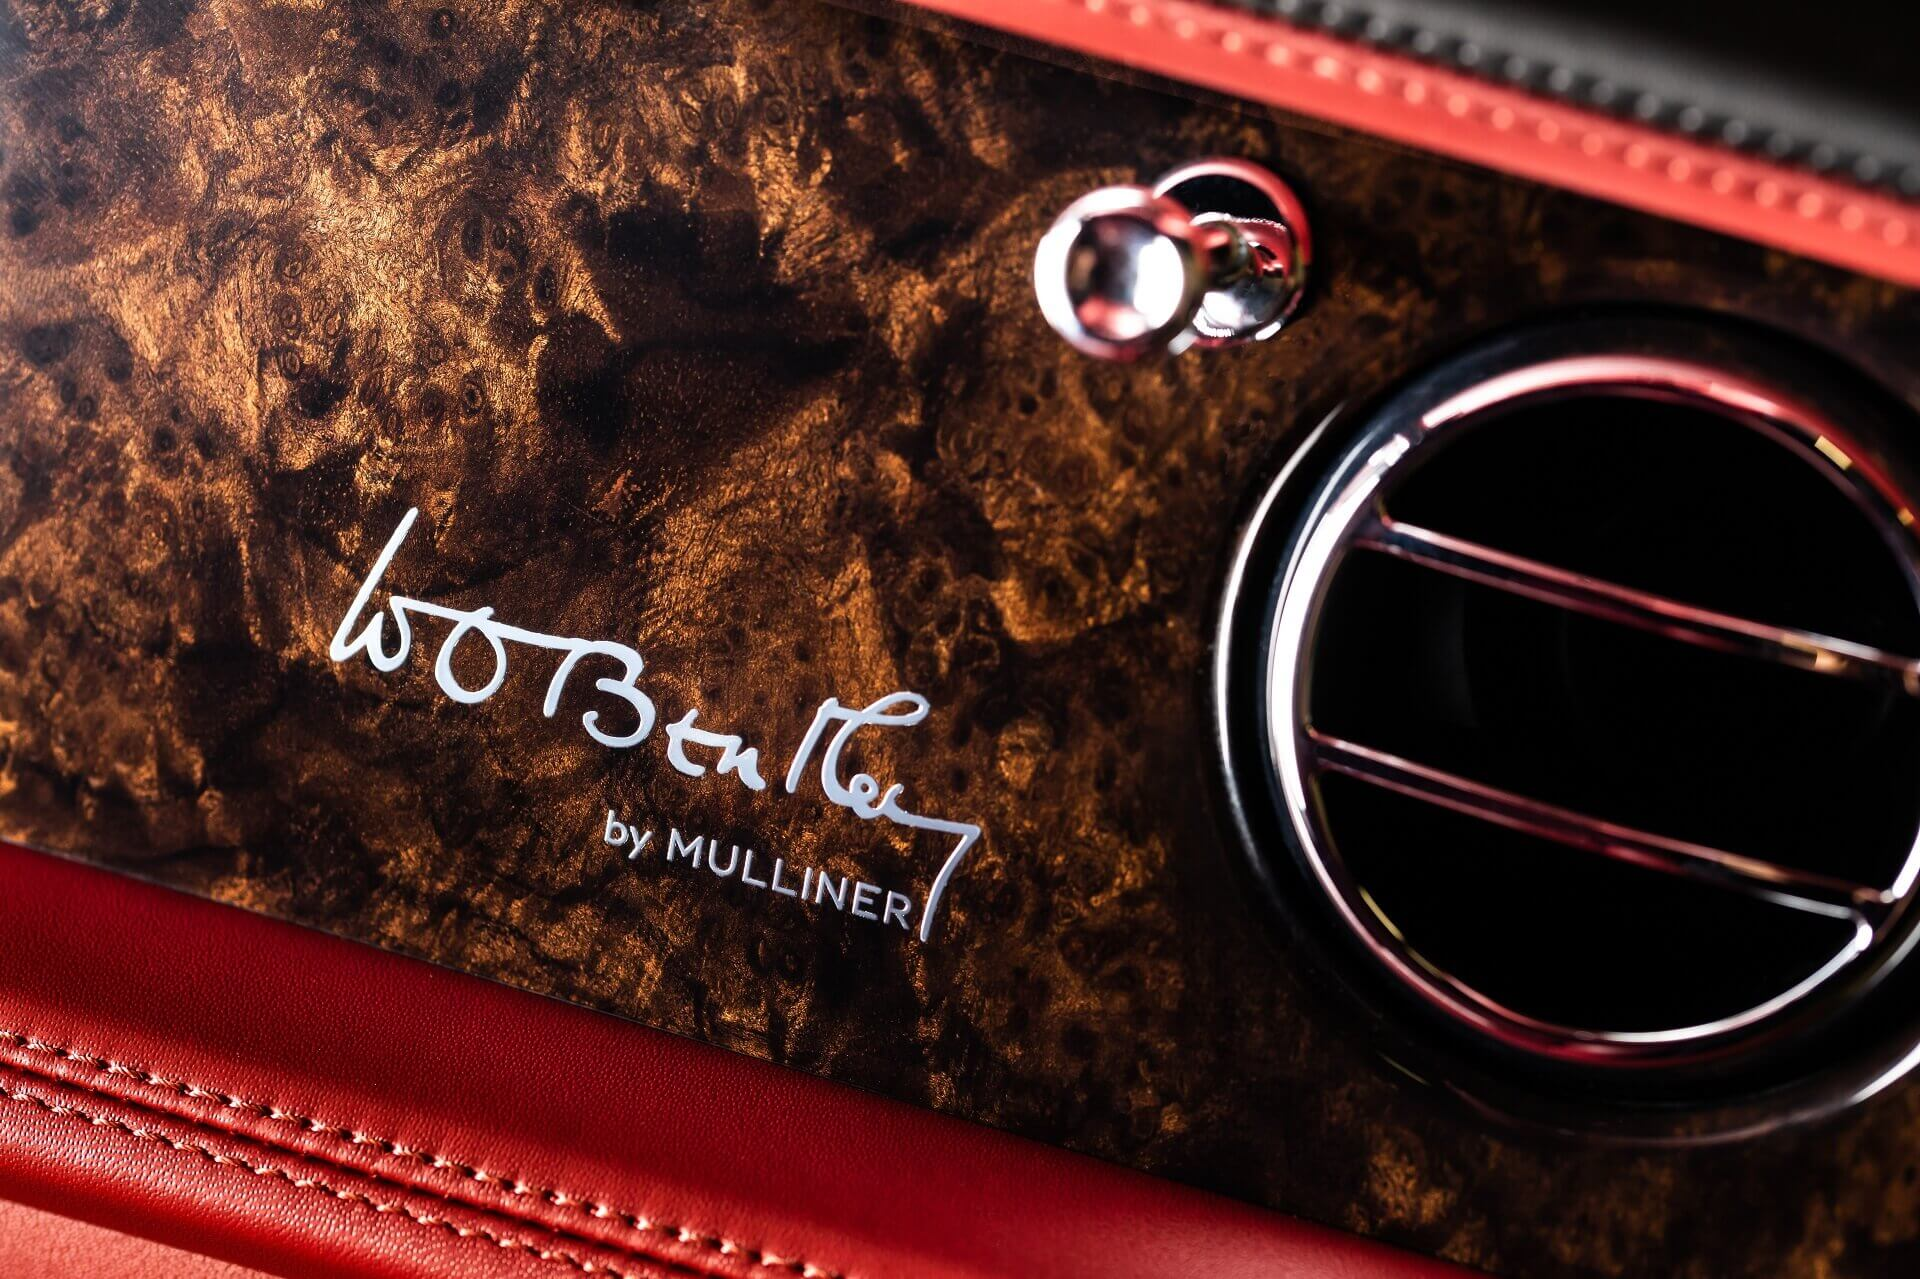 Bentley Mulsanne - Η υπογραφή